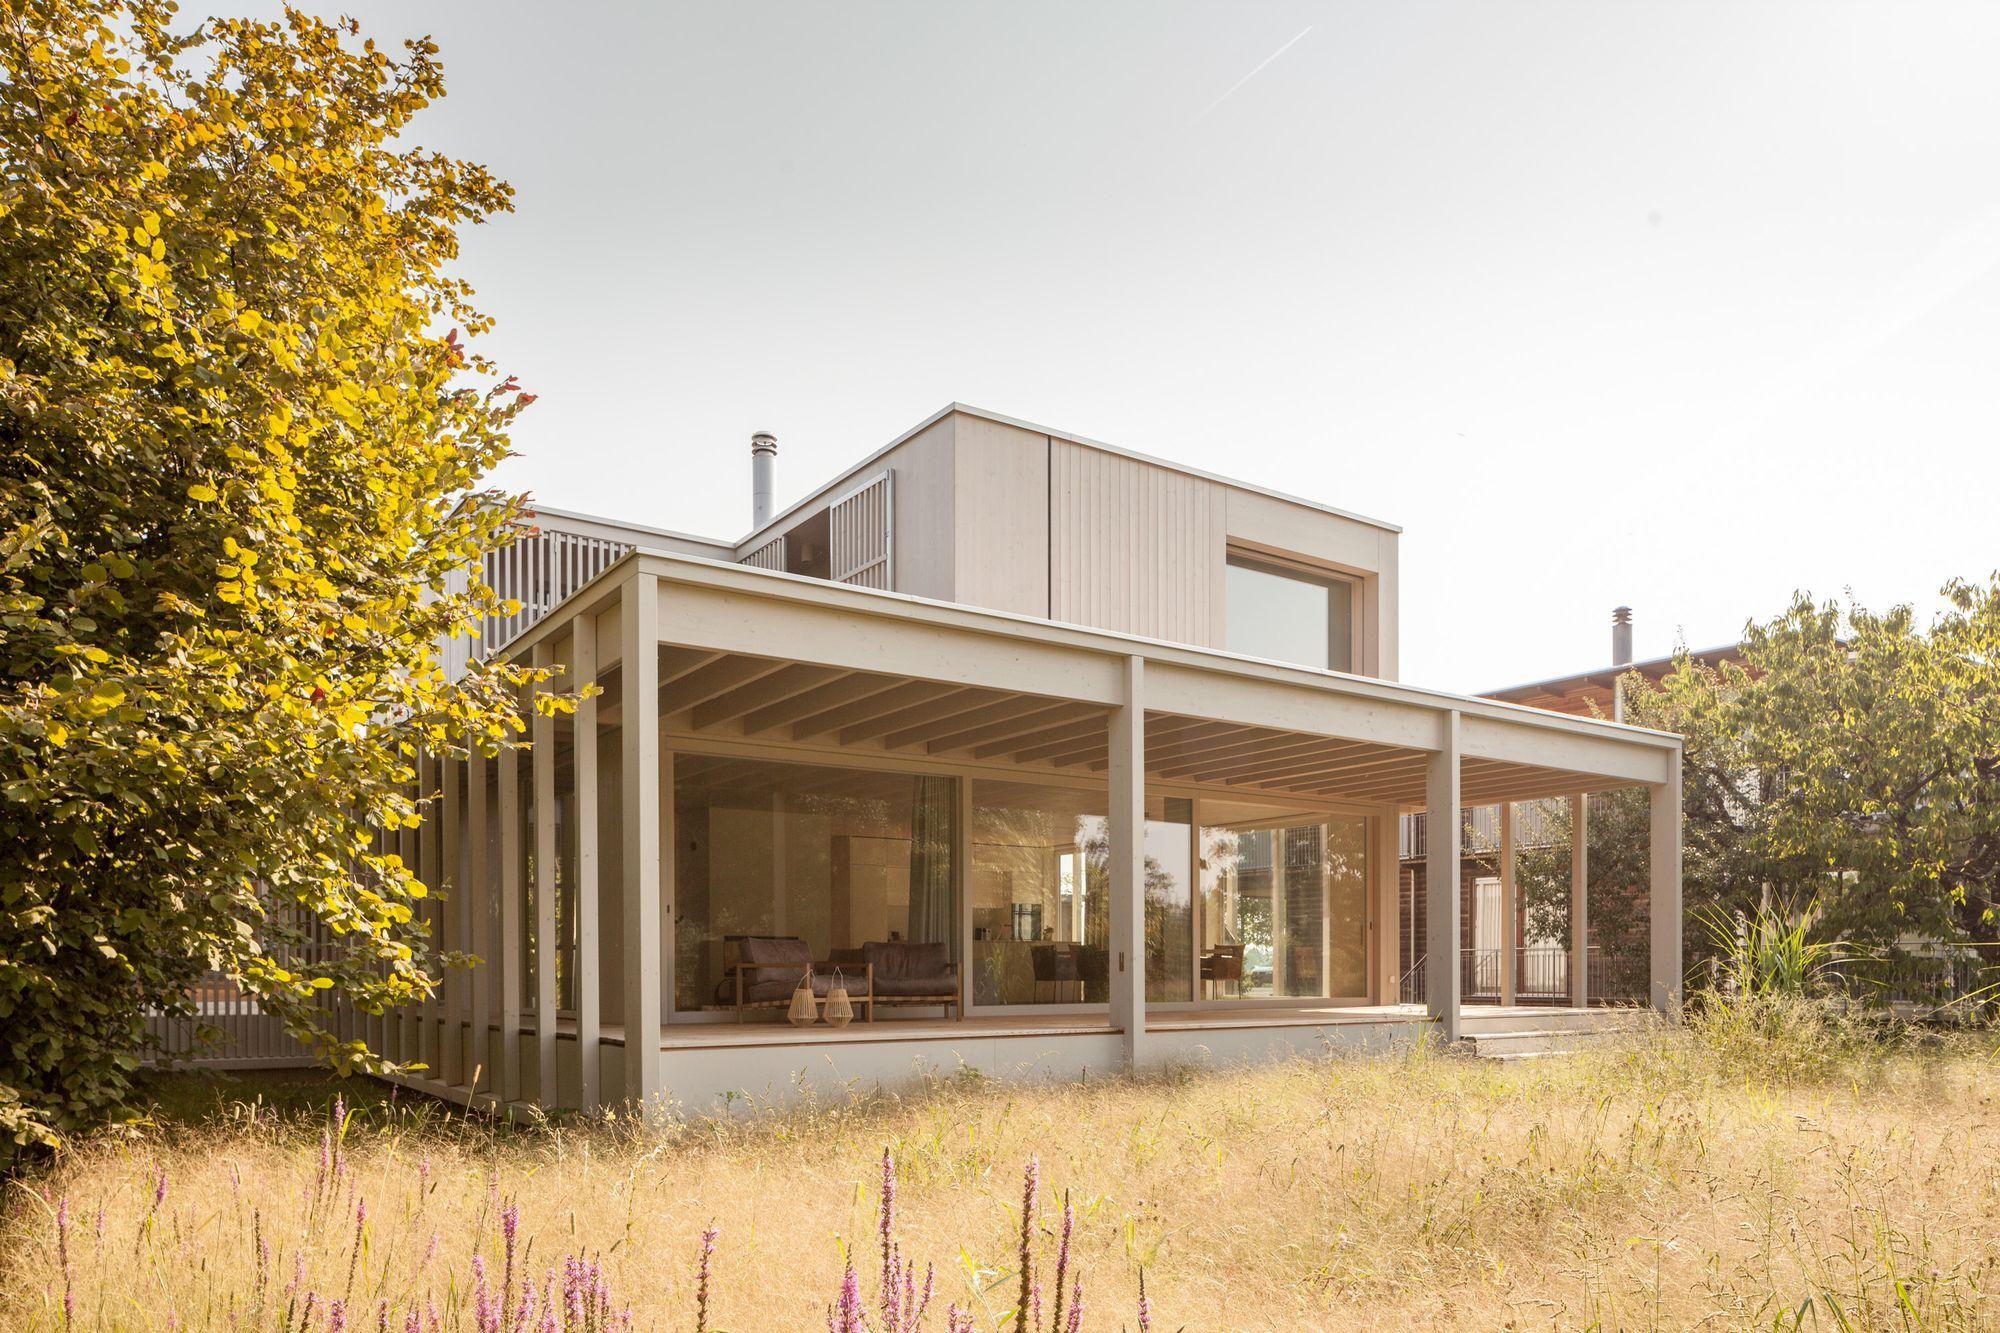 House at Lake Biel / Markus Schietsch